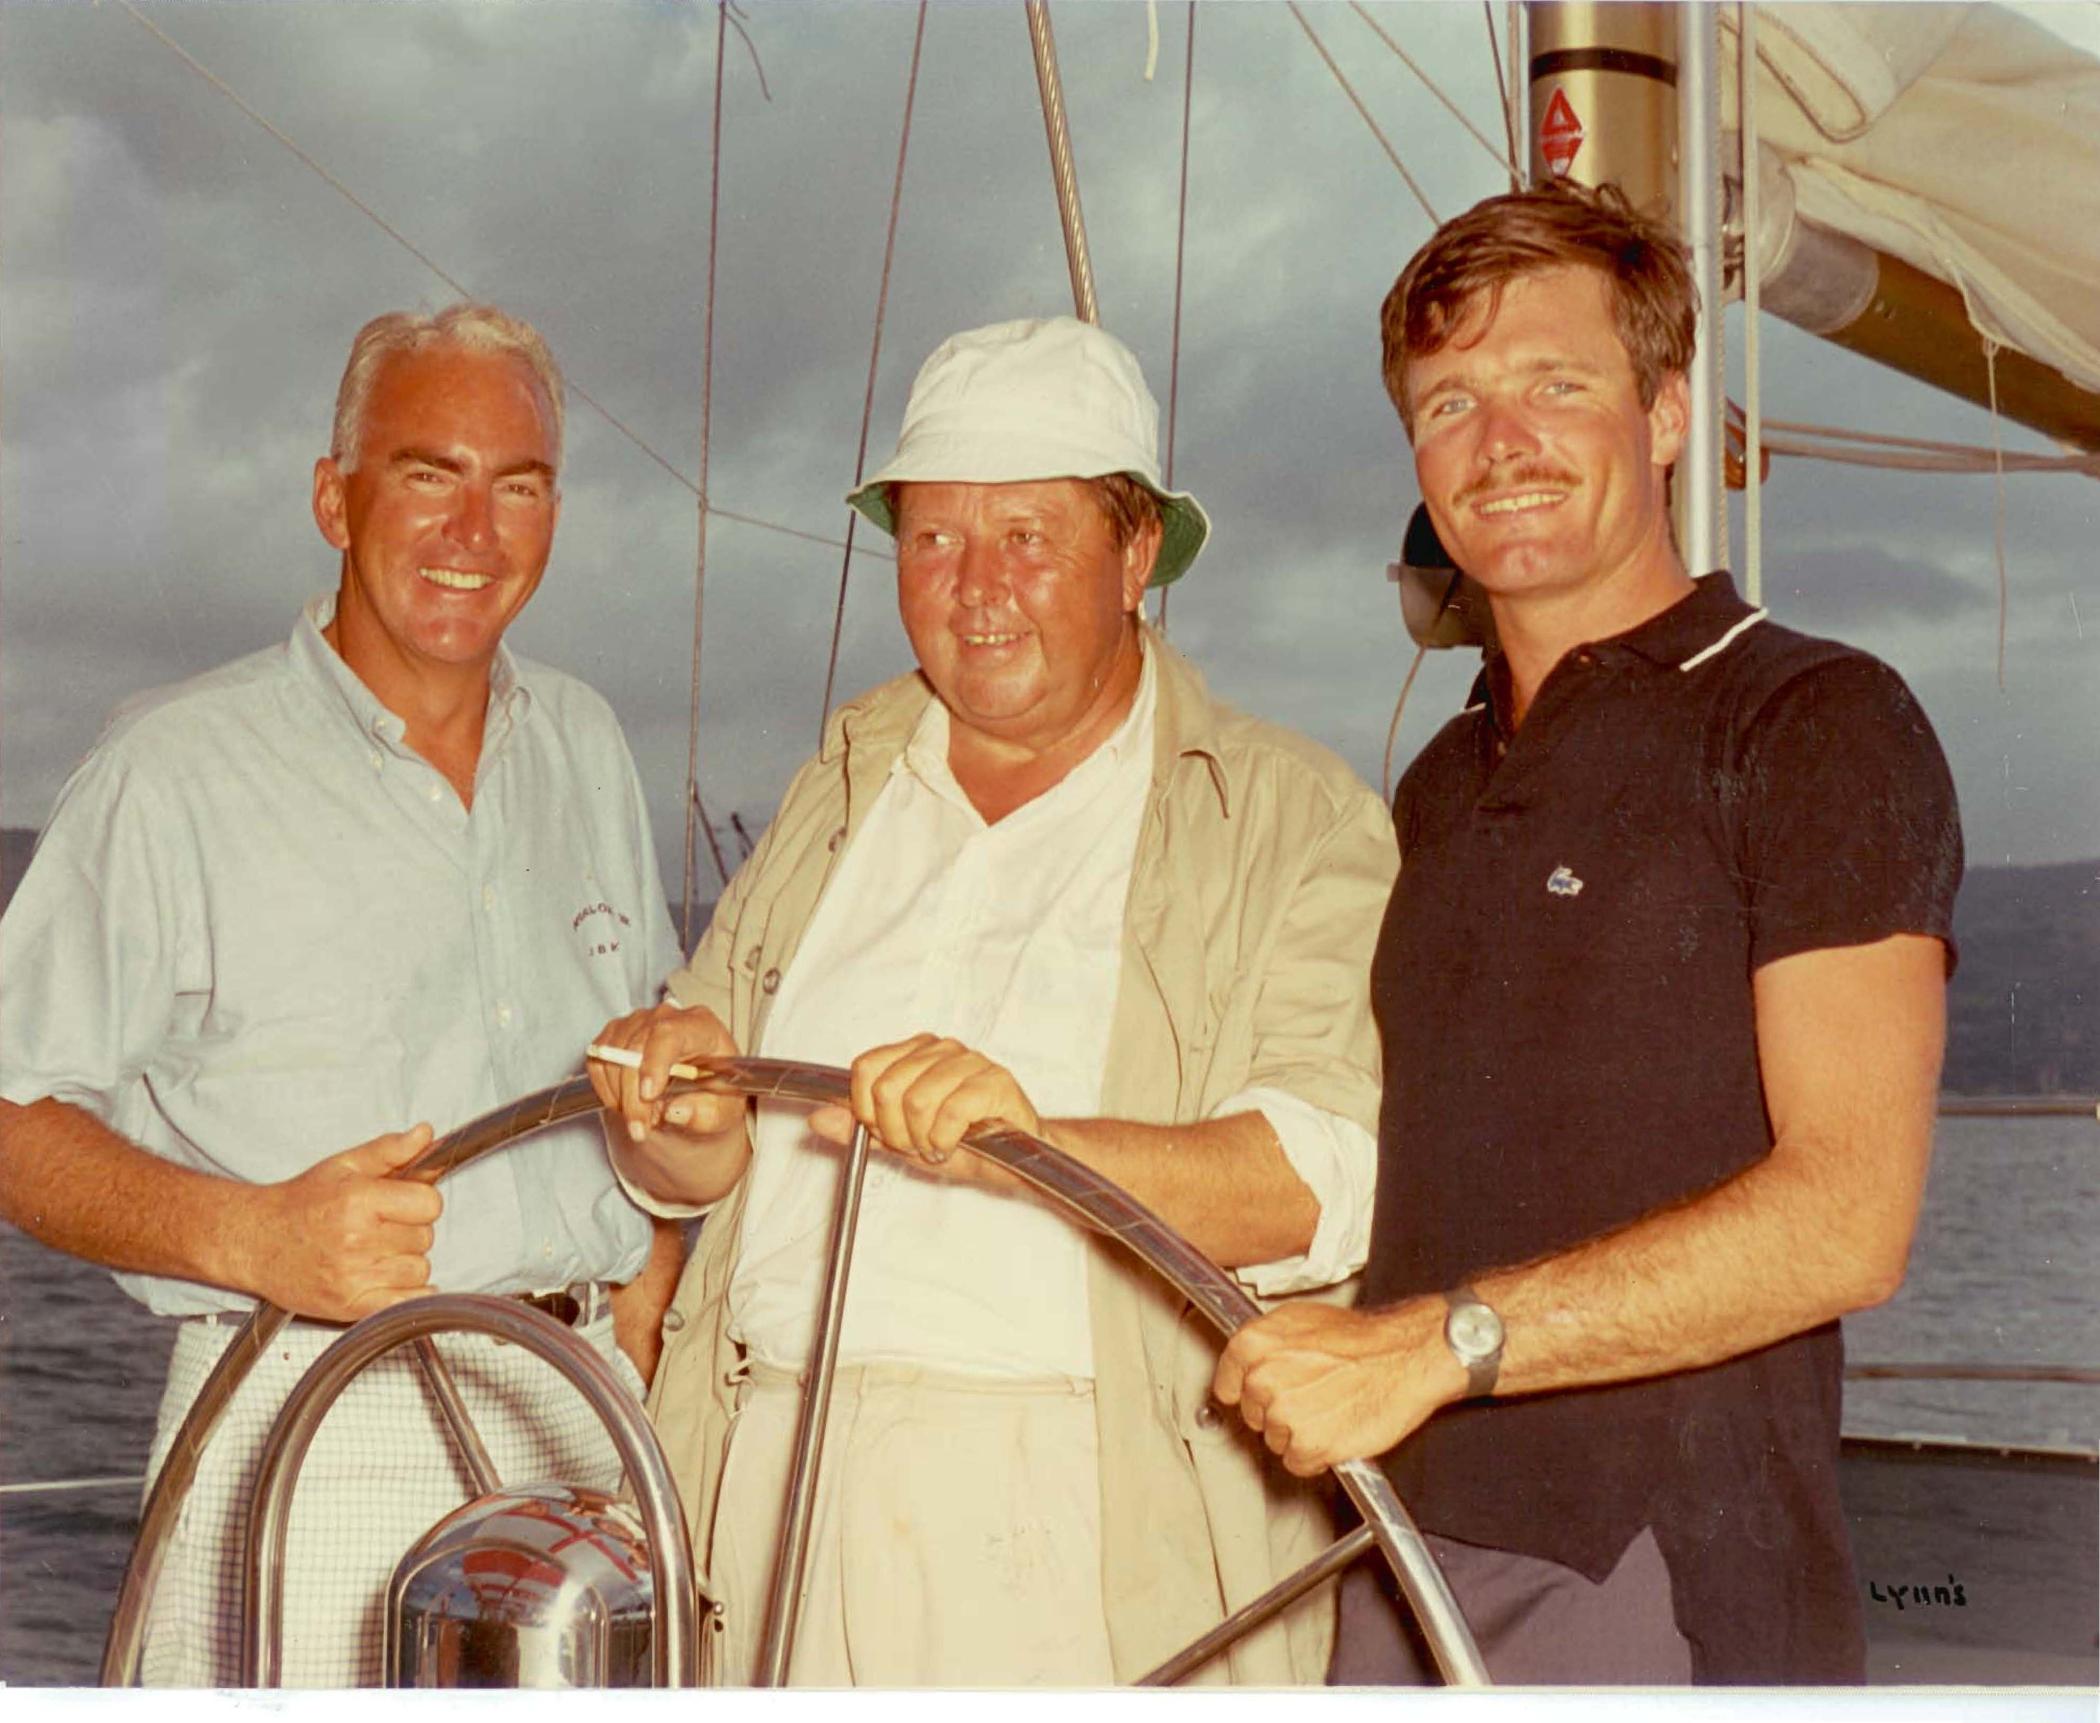 1967 - JBKSr (Jim Kilroy), Bob Johnson of Windward Passage, and Ted Turner of Tenacious at the Transpac Race